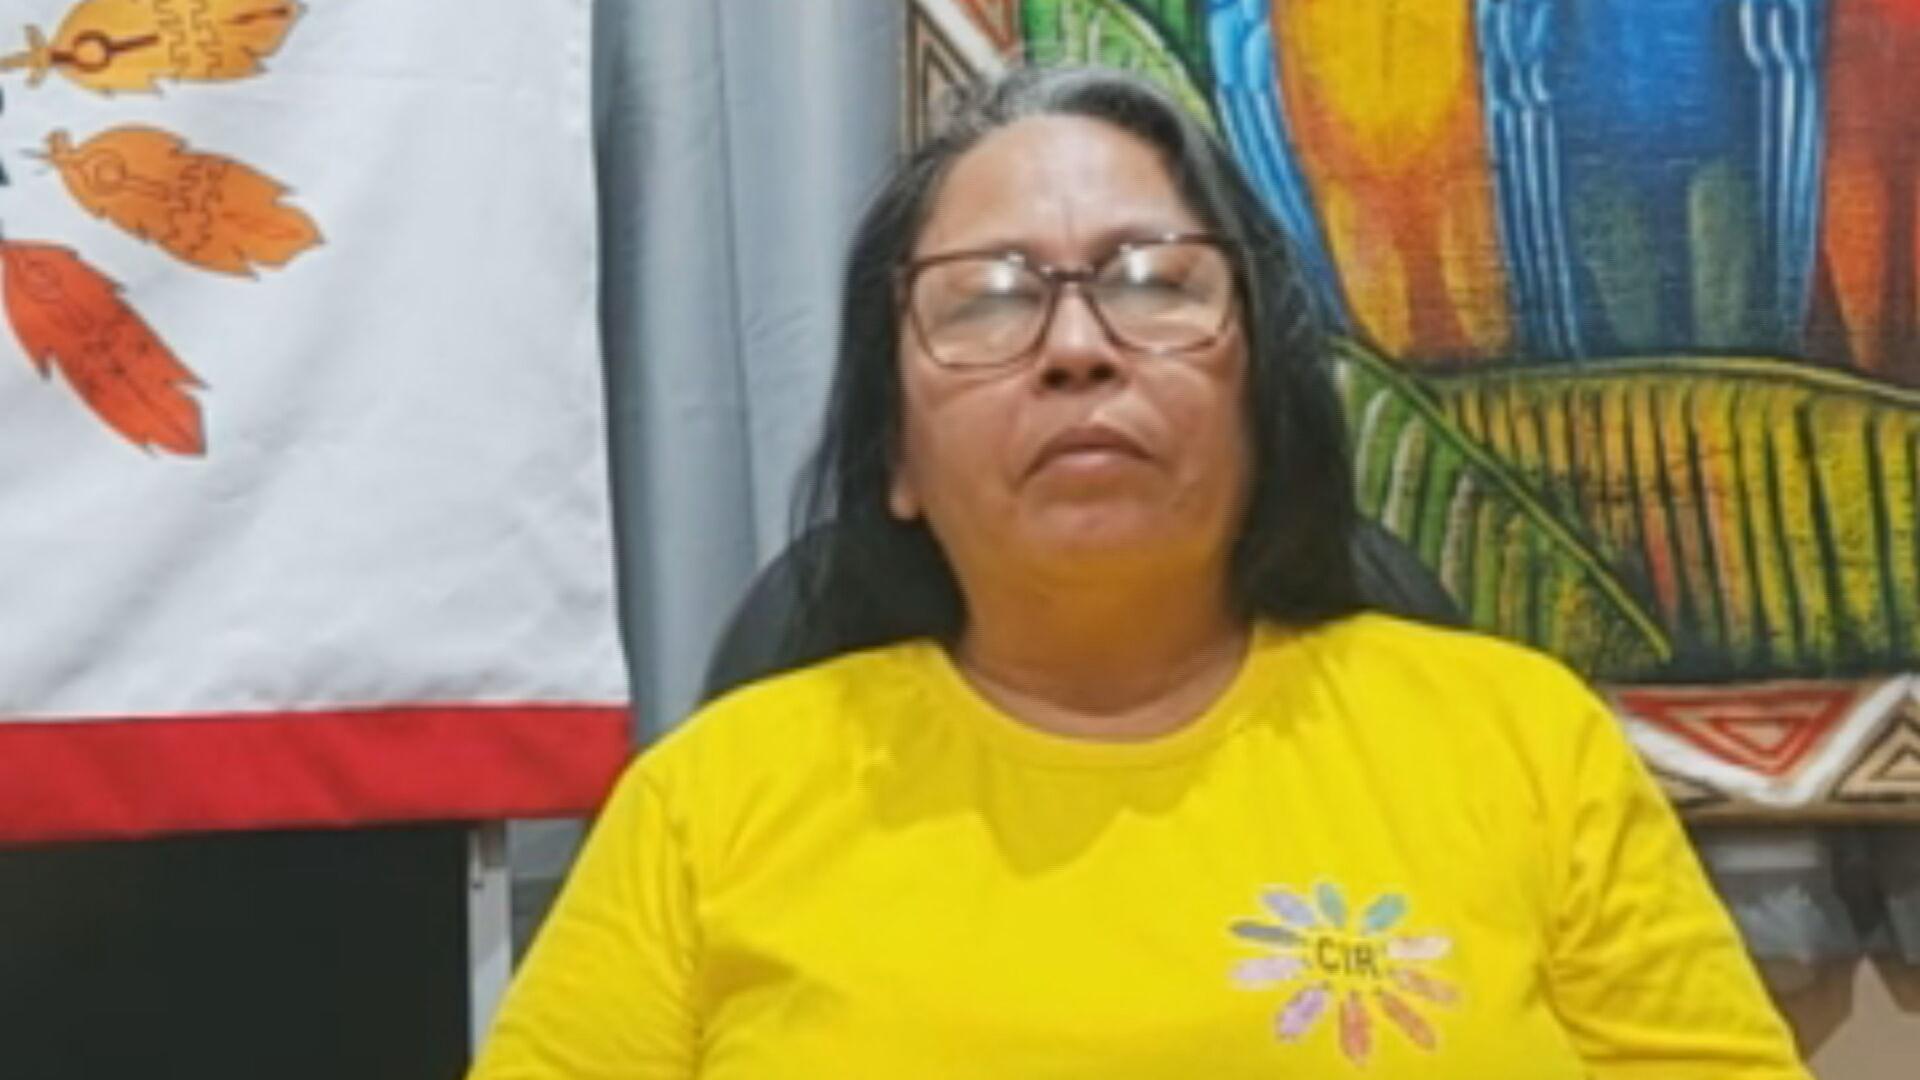 A líder indígena Sinéia do Vale Wapichana conversou com a CNN sobre a Cúpula do